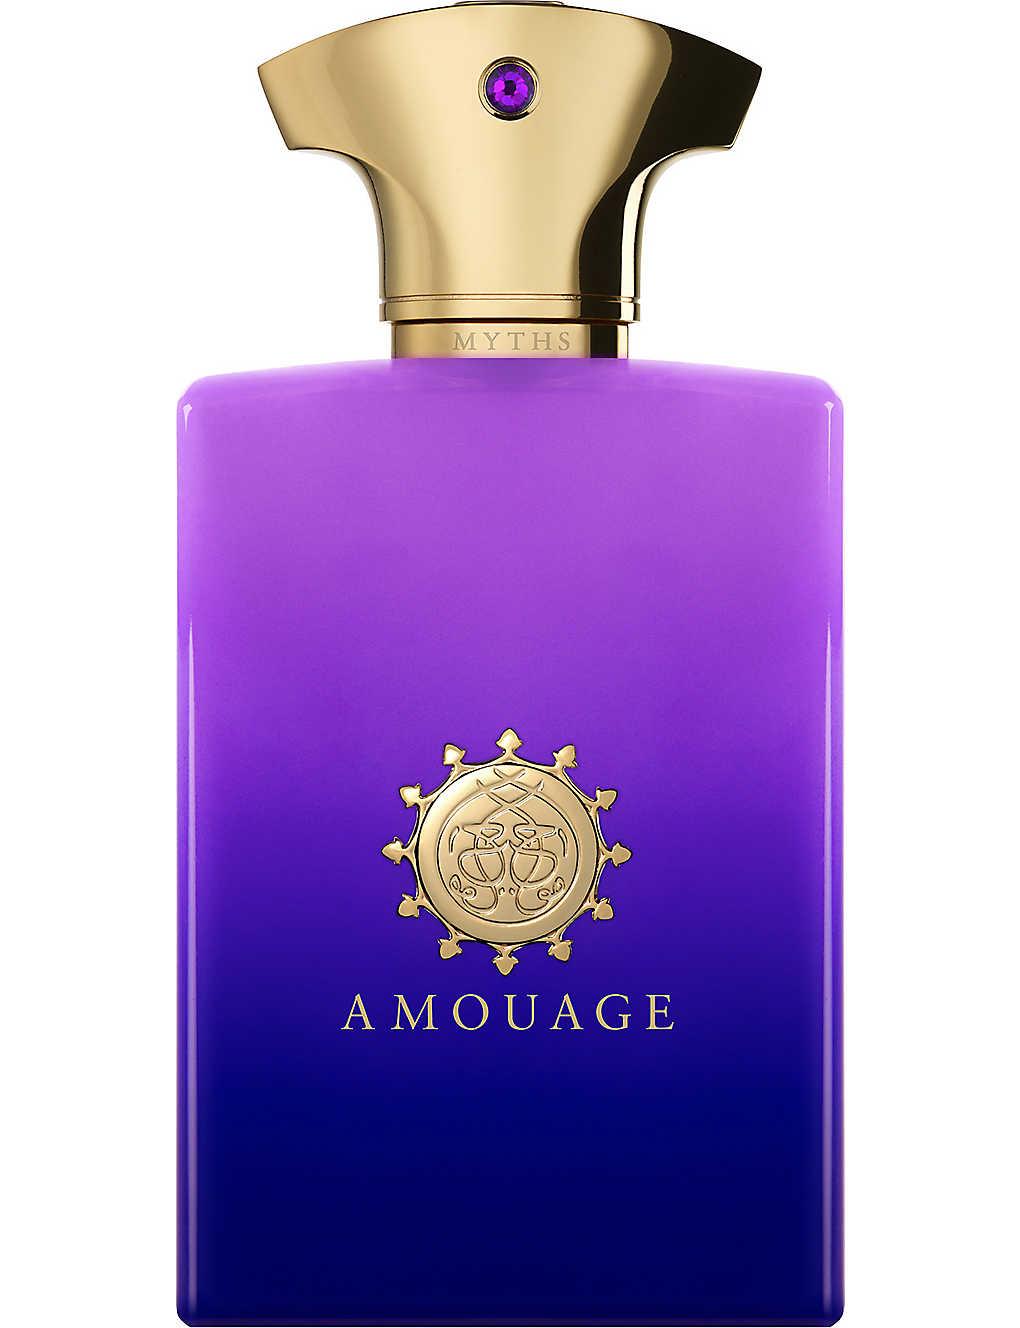 Amouage Myths Man Eau De Parfum 100ml Selfridgescom